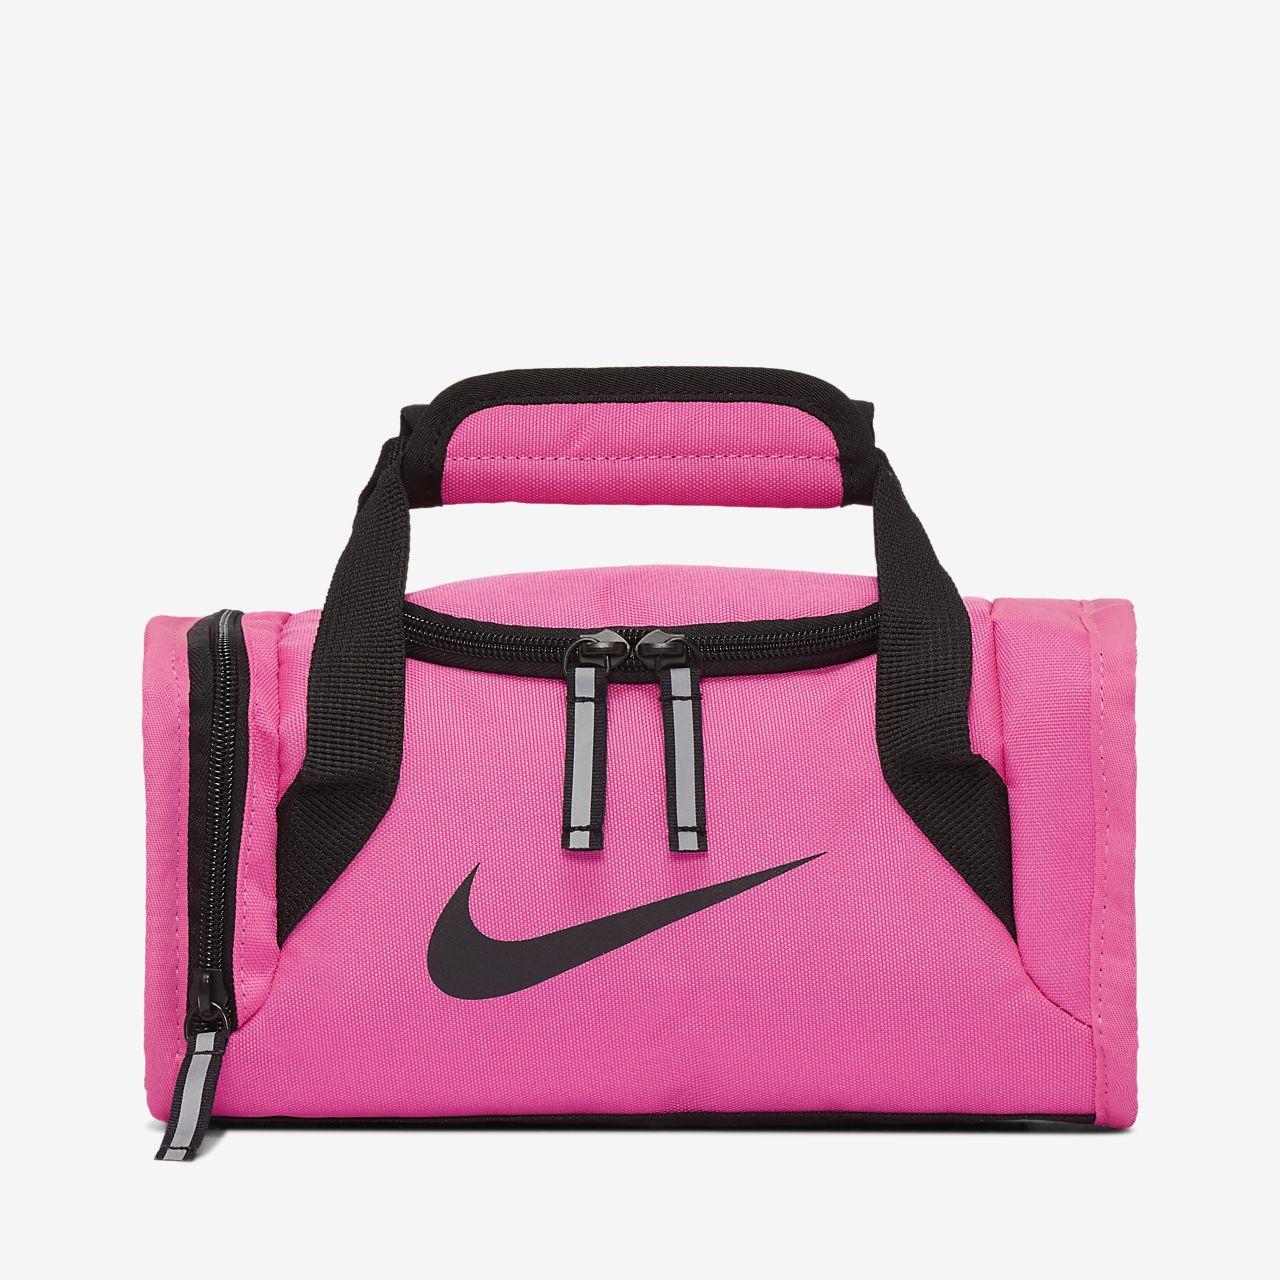 Nike Brasilia Fuel Pack Bolsa para el almuerzo